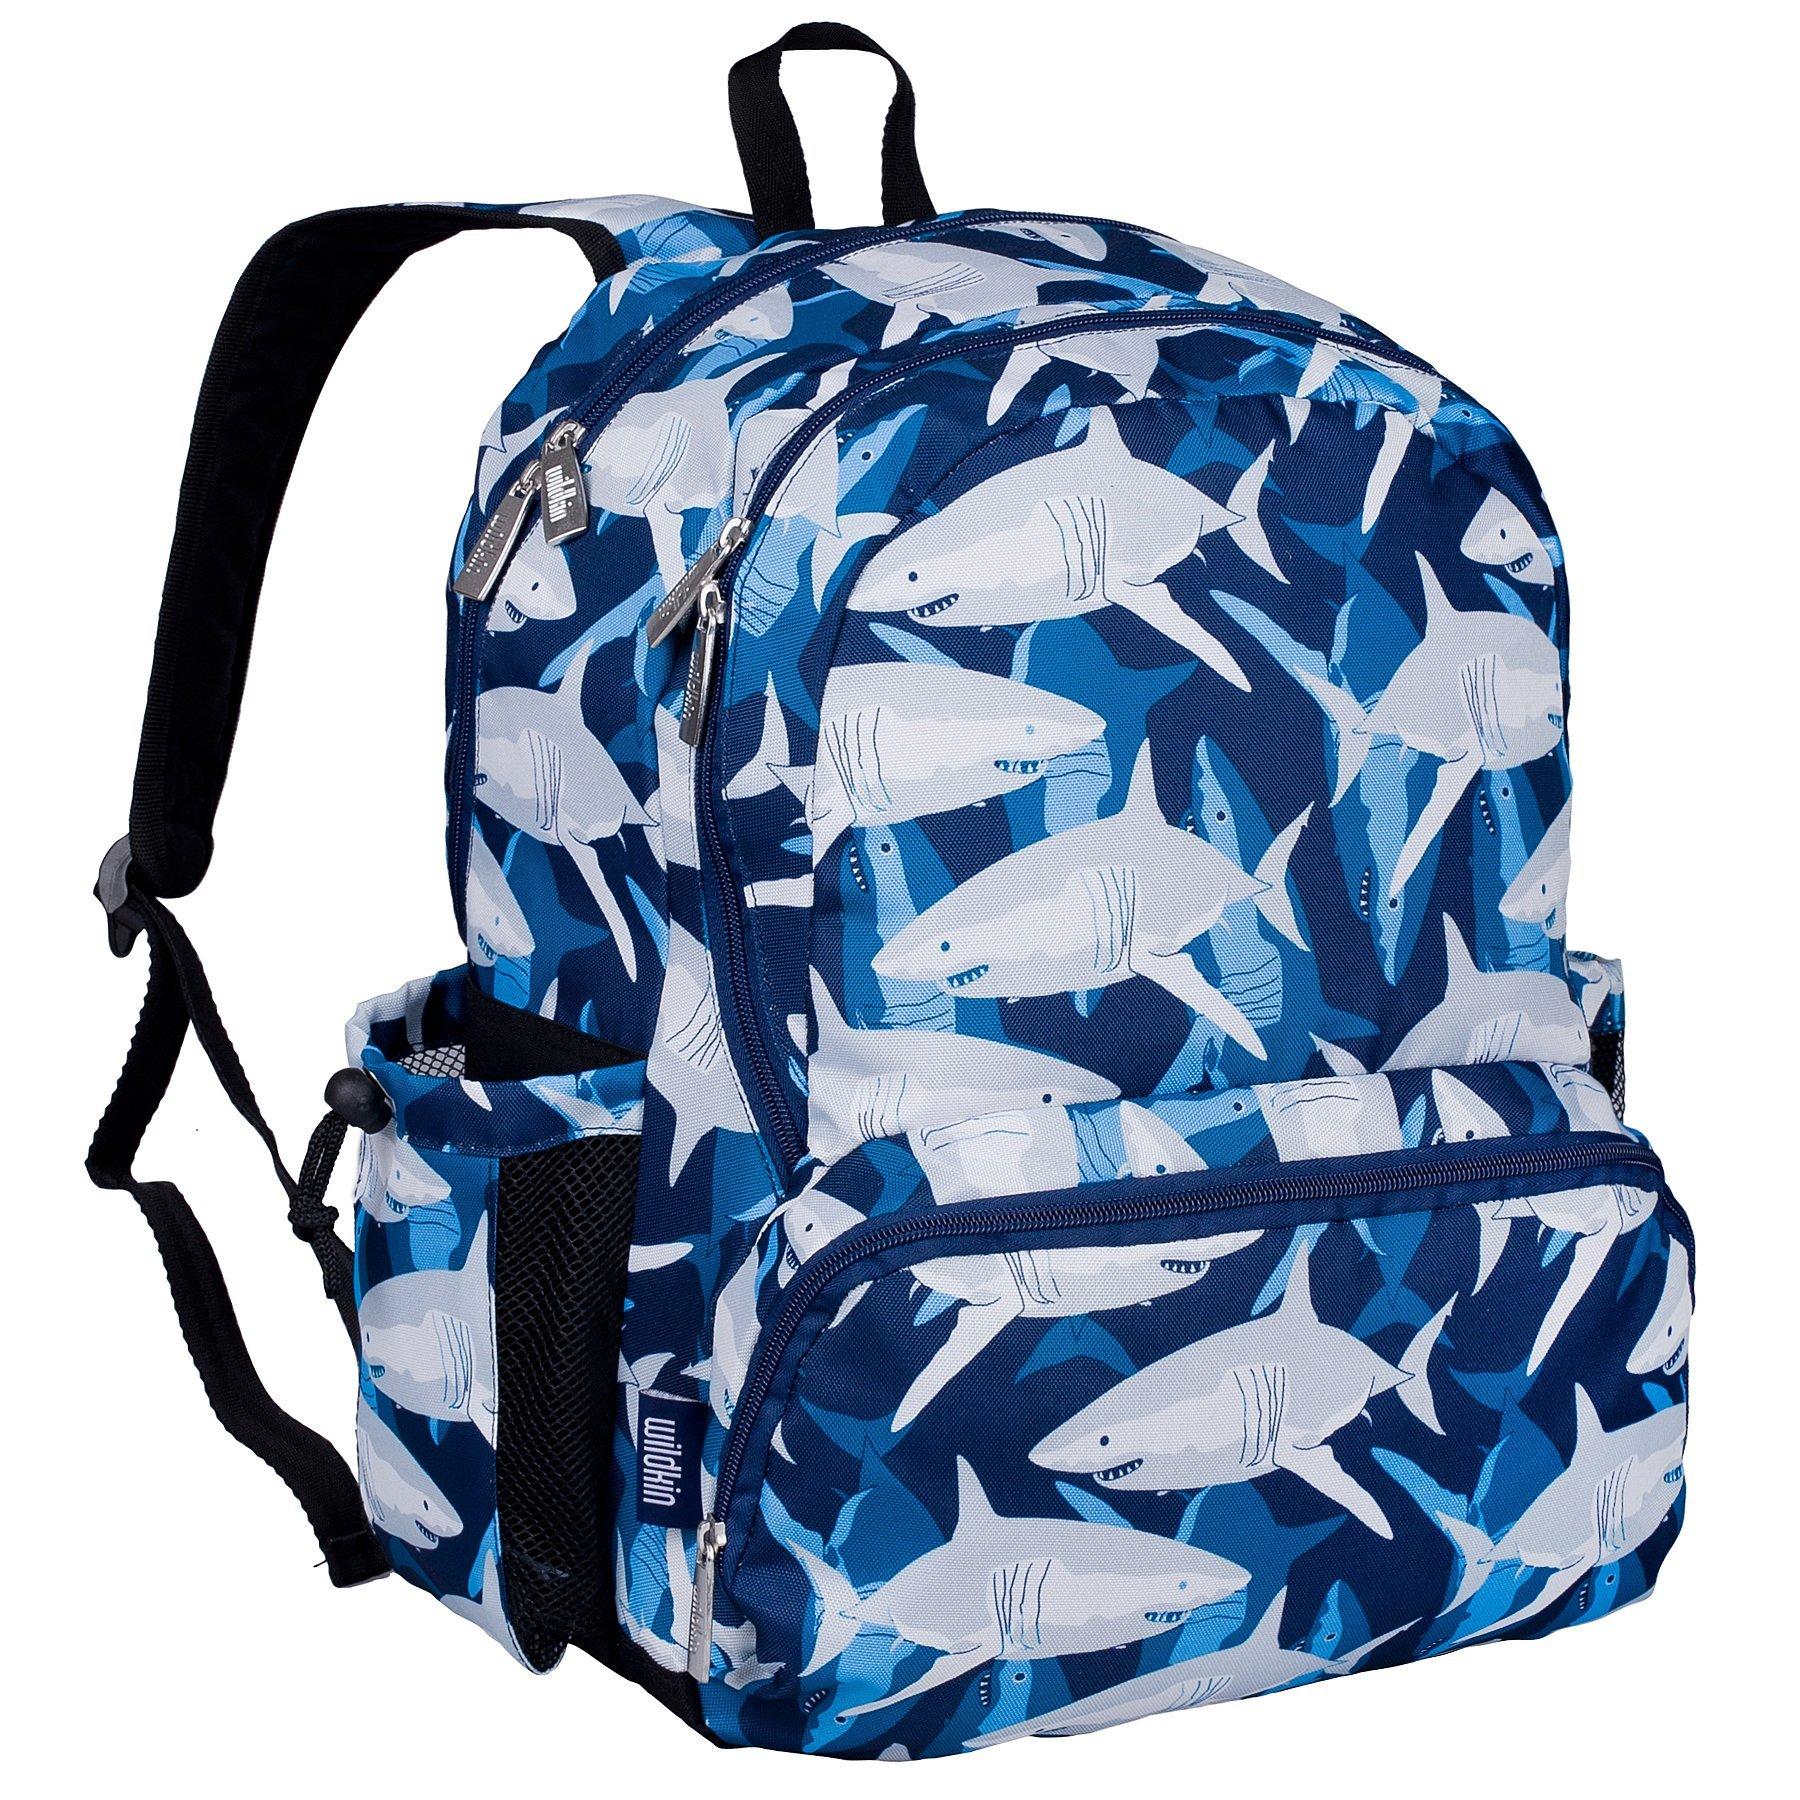 Wildkin 17 Inch Backpack, Sharks